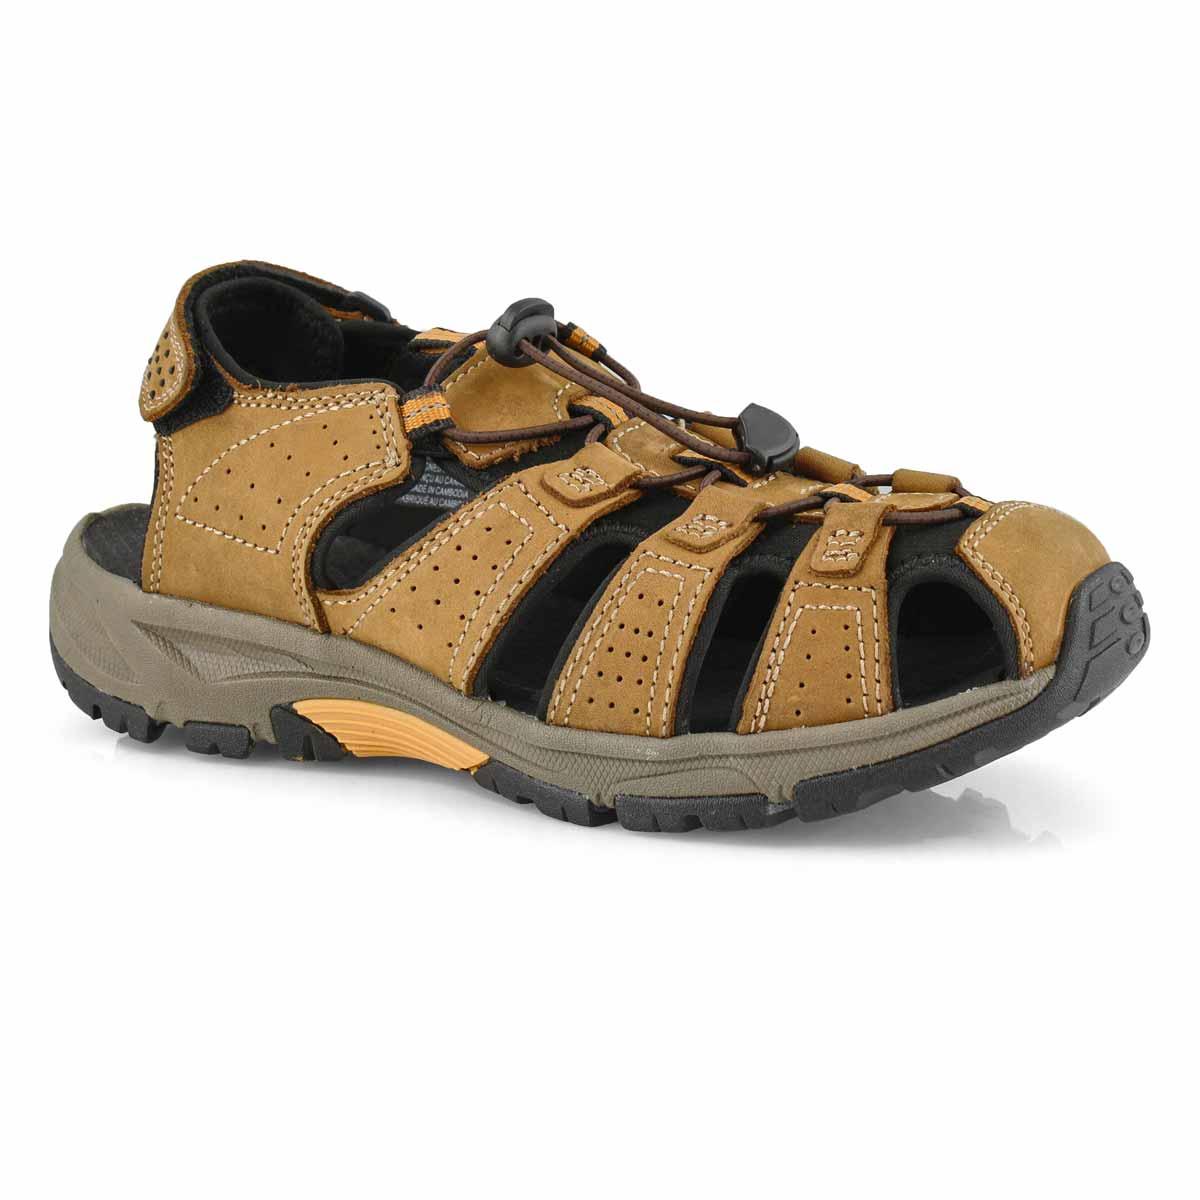 Mns Linus 2 brown fisherman sandal